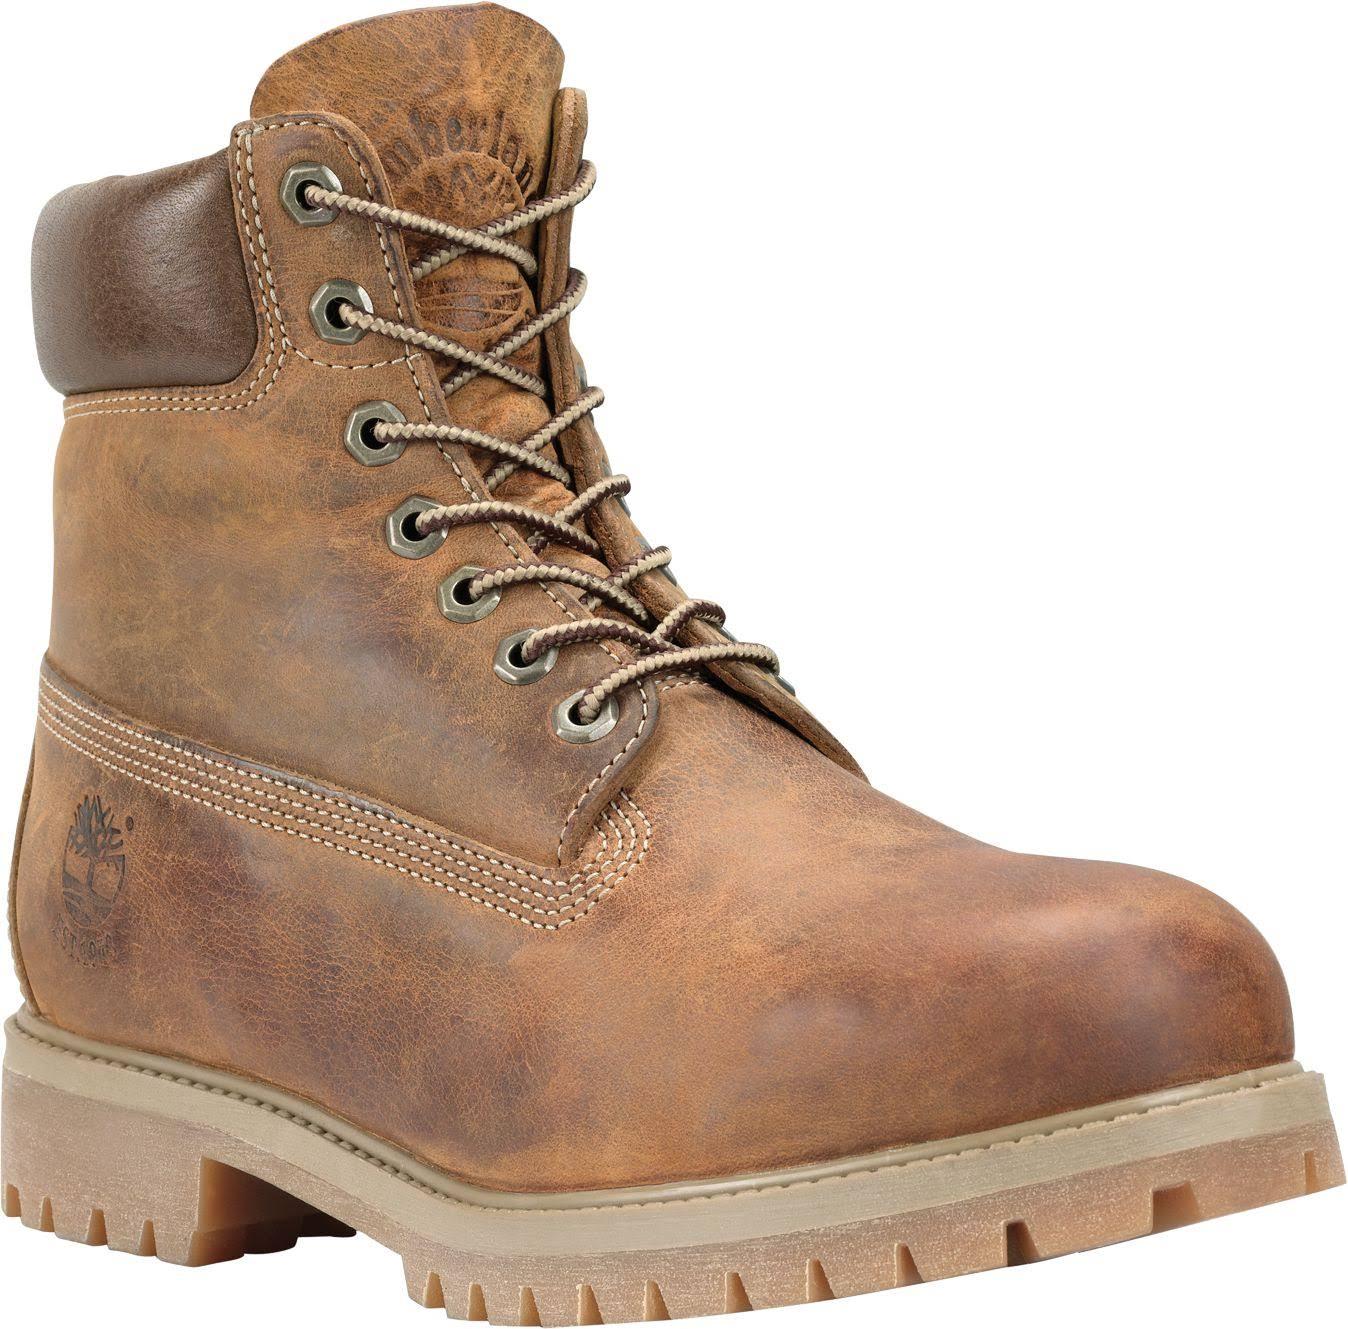 Boot Timberland 40 Heritage Eu 6 In Burntorangewornoiled Wide Premium WH2DYIE9